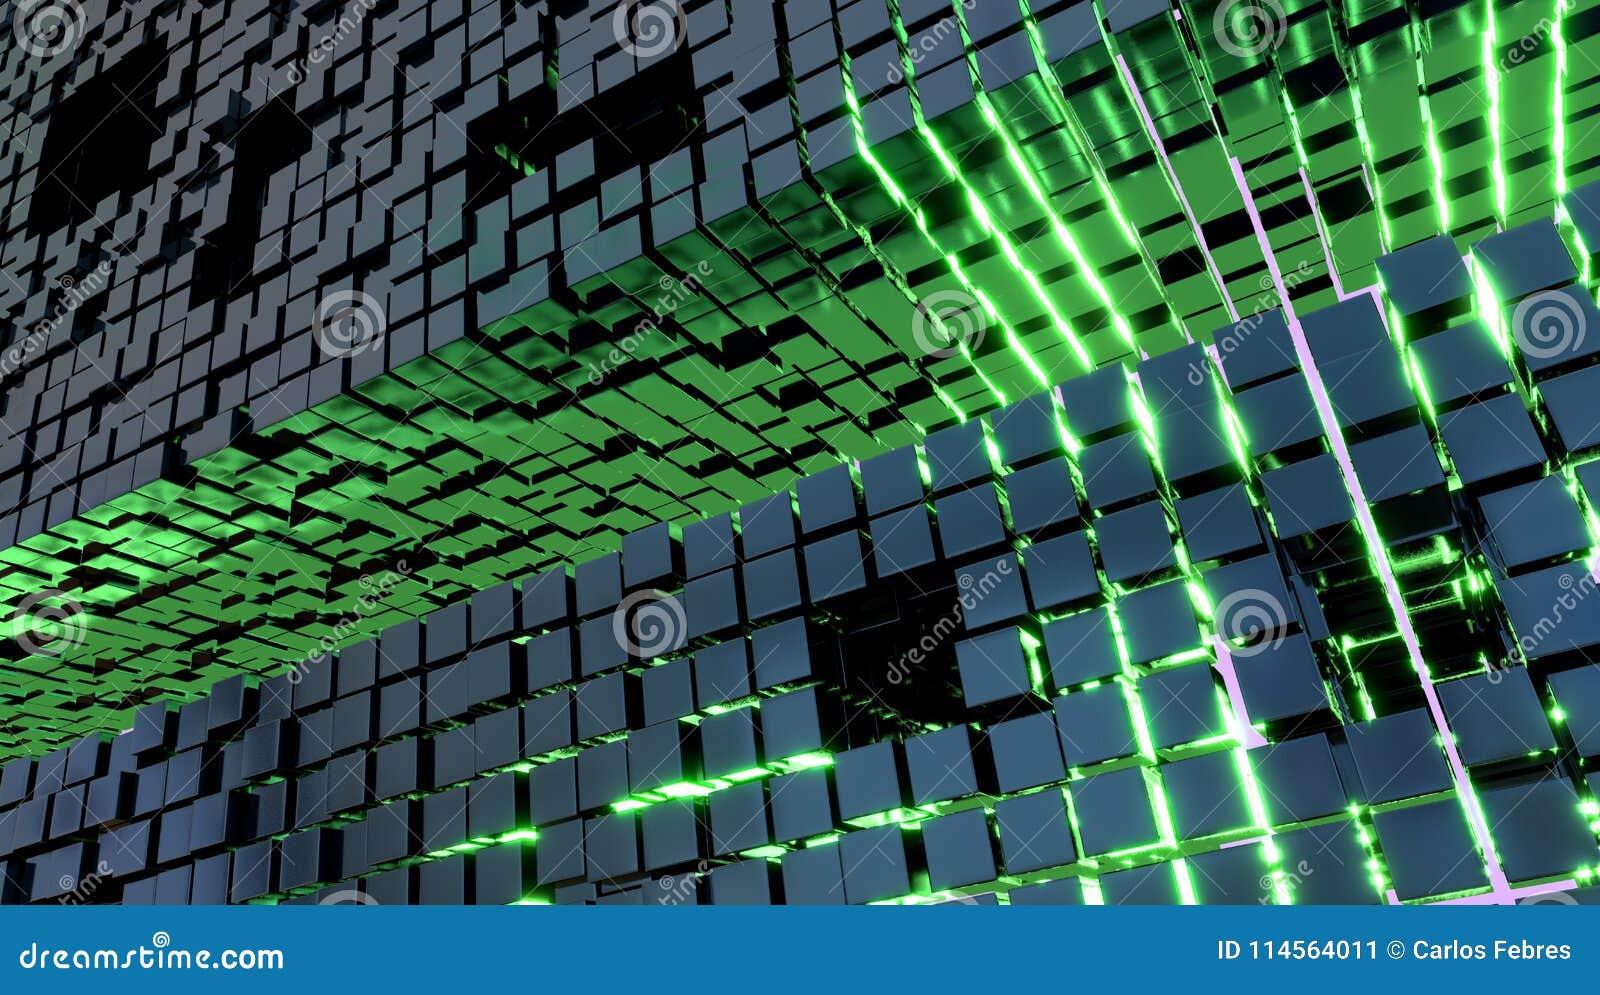 Wallpaper avec des cubes en métal et un feu vert, l illustration 3d